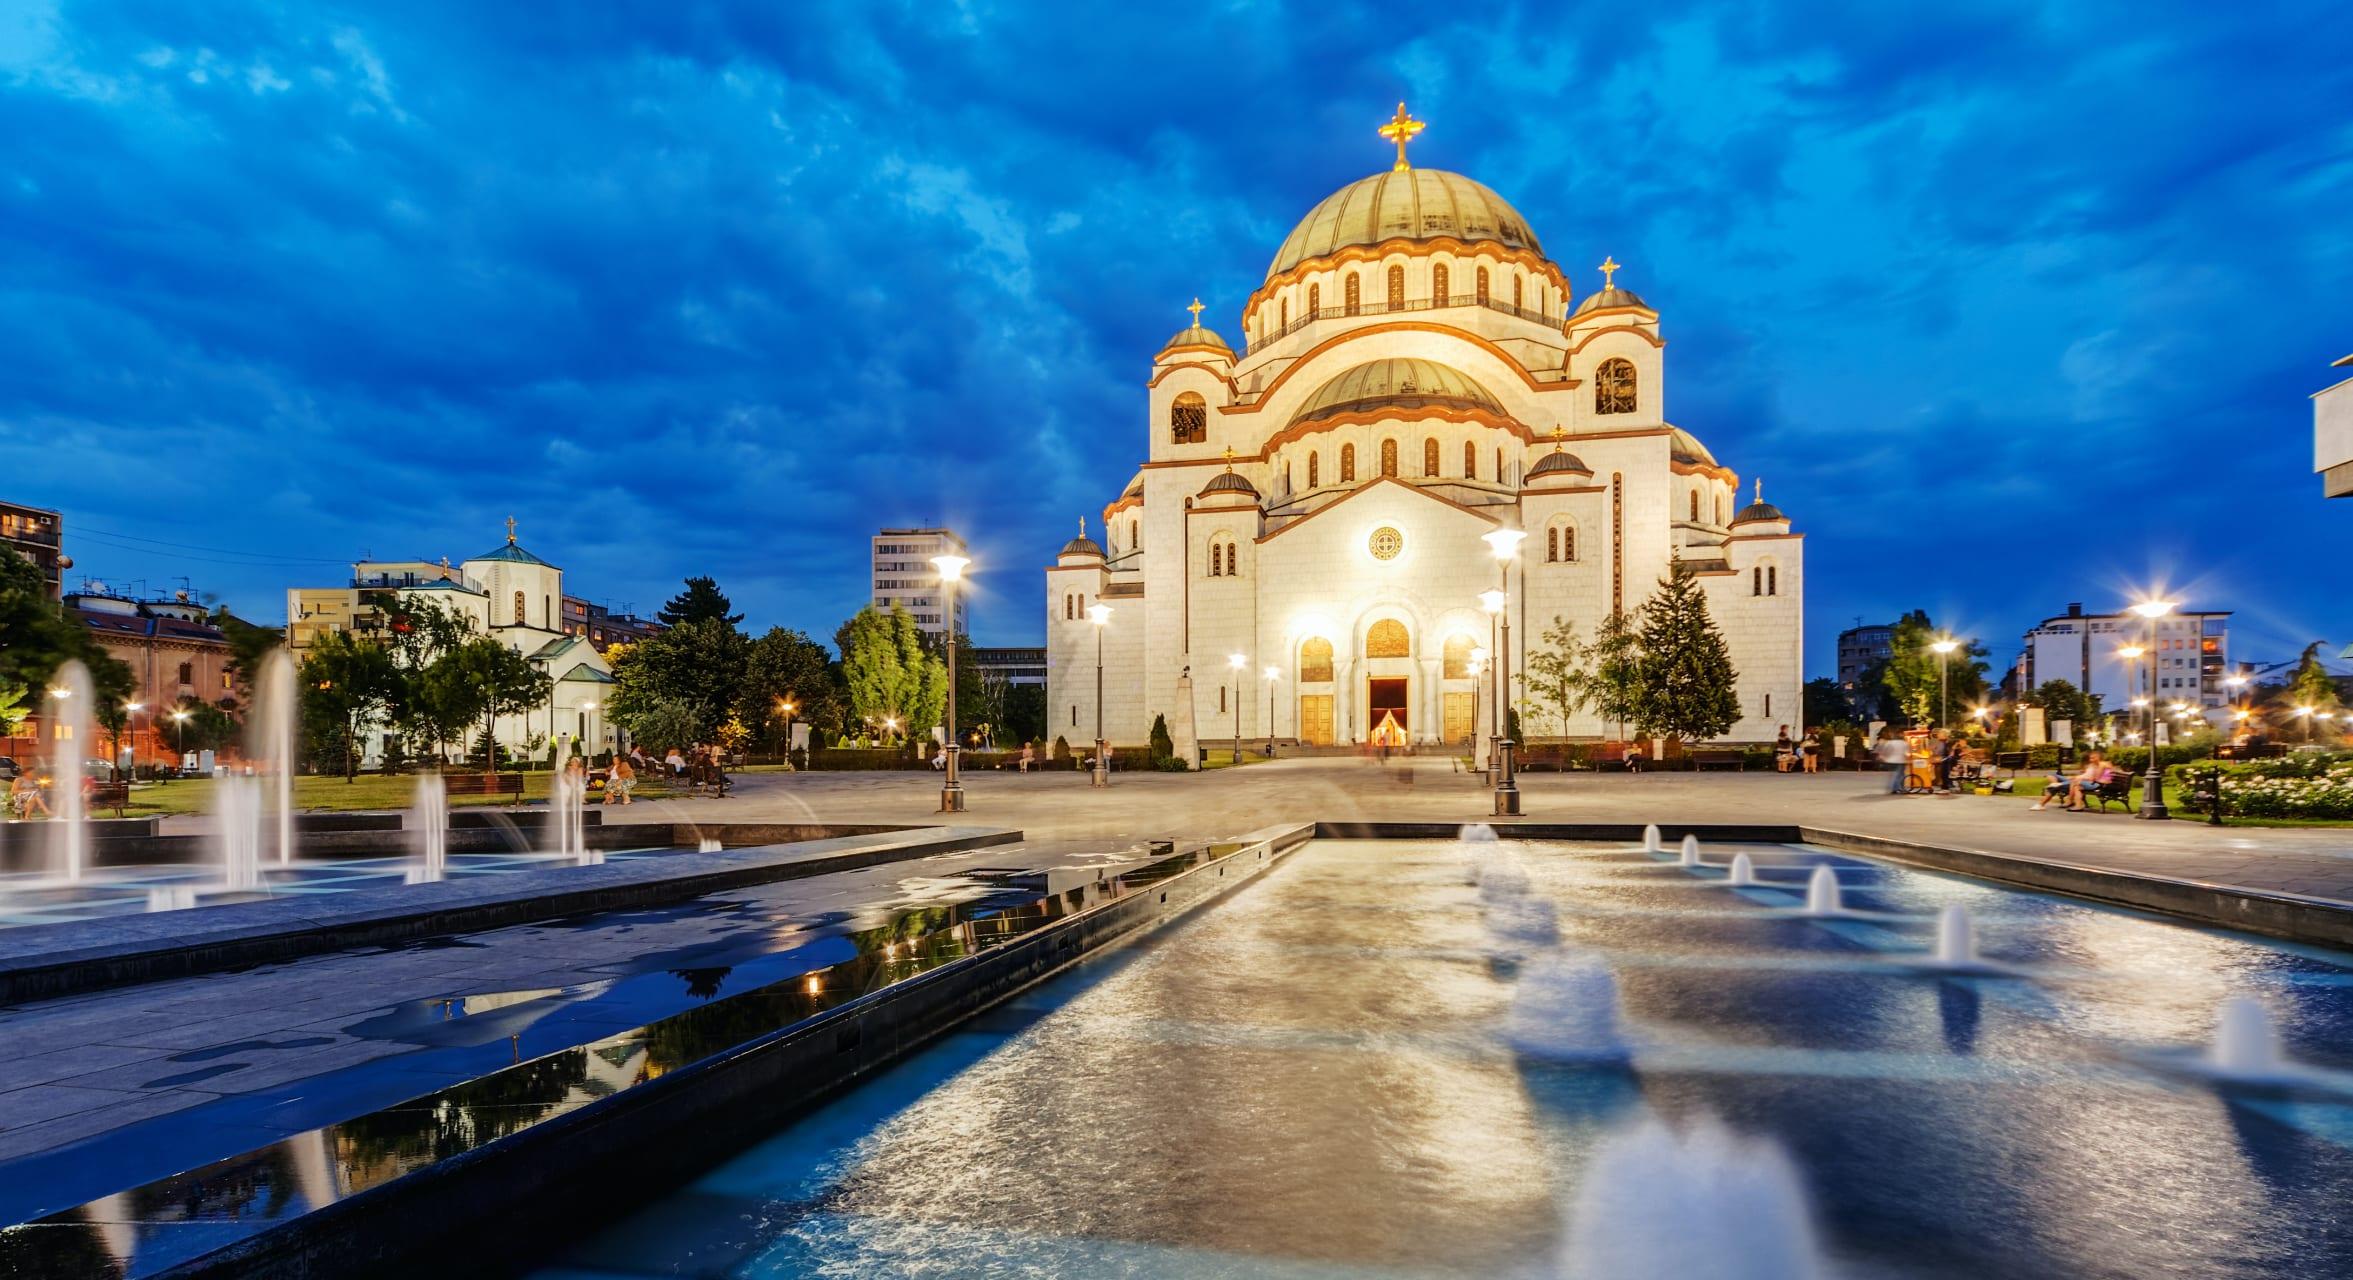 Belgrade - Serbian Orthodox Mega-Structure: Cathedral of Saint Sava